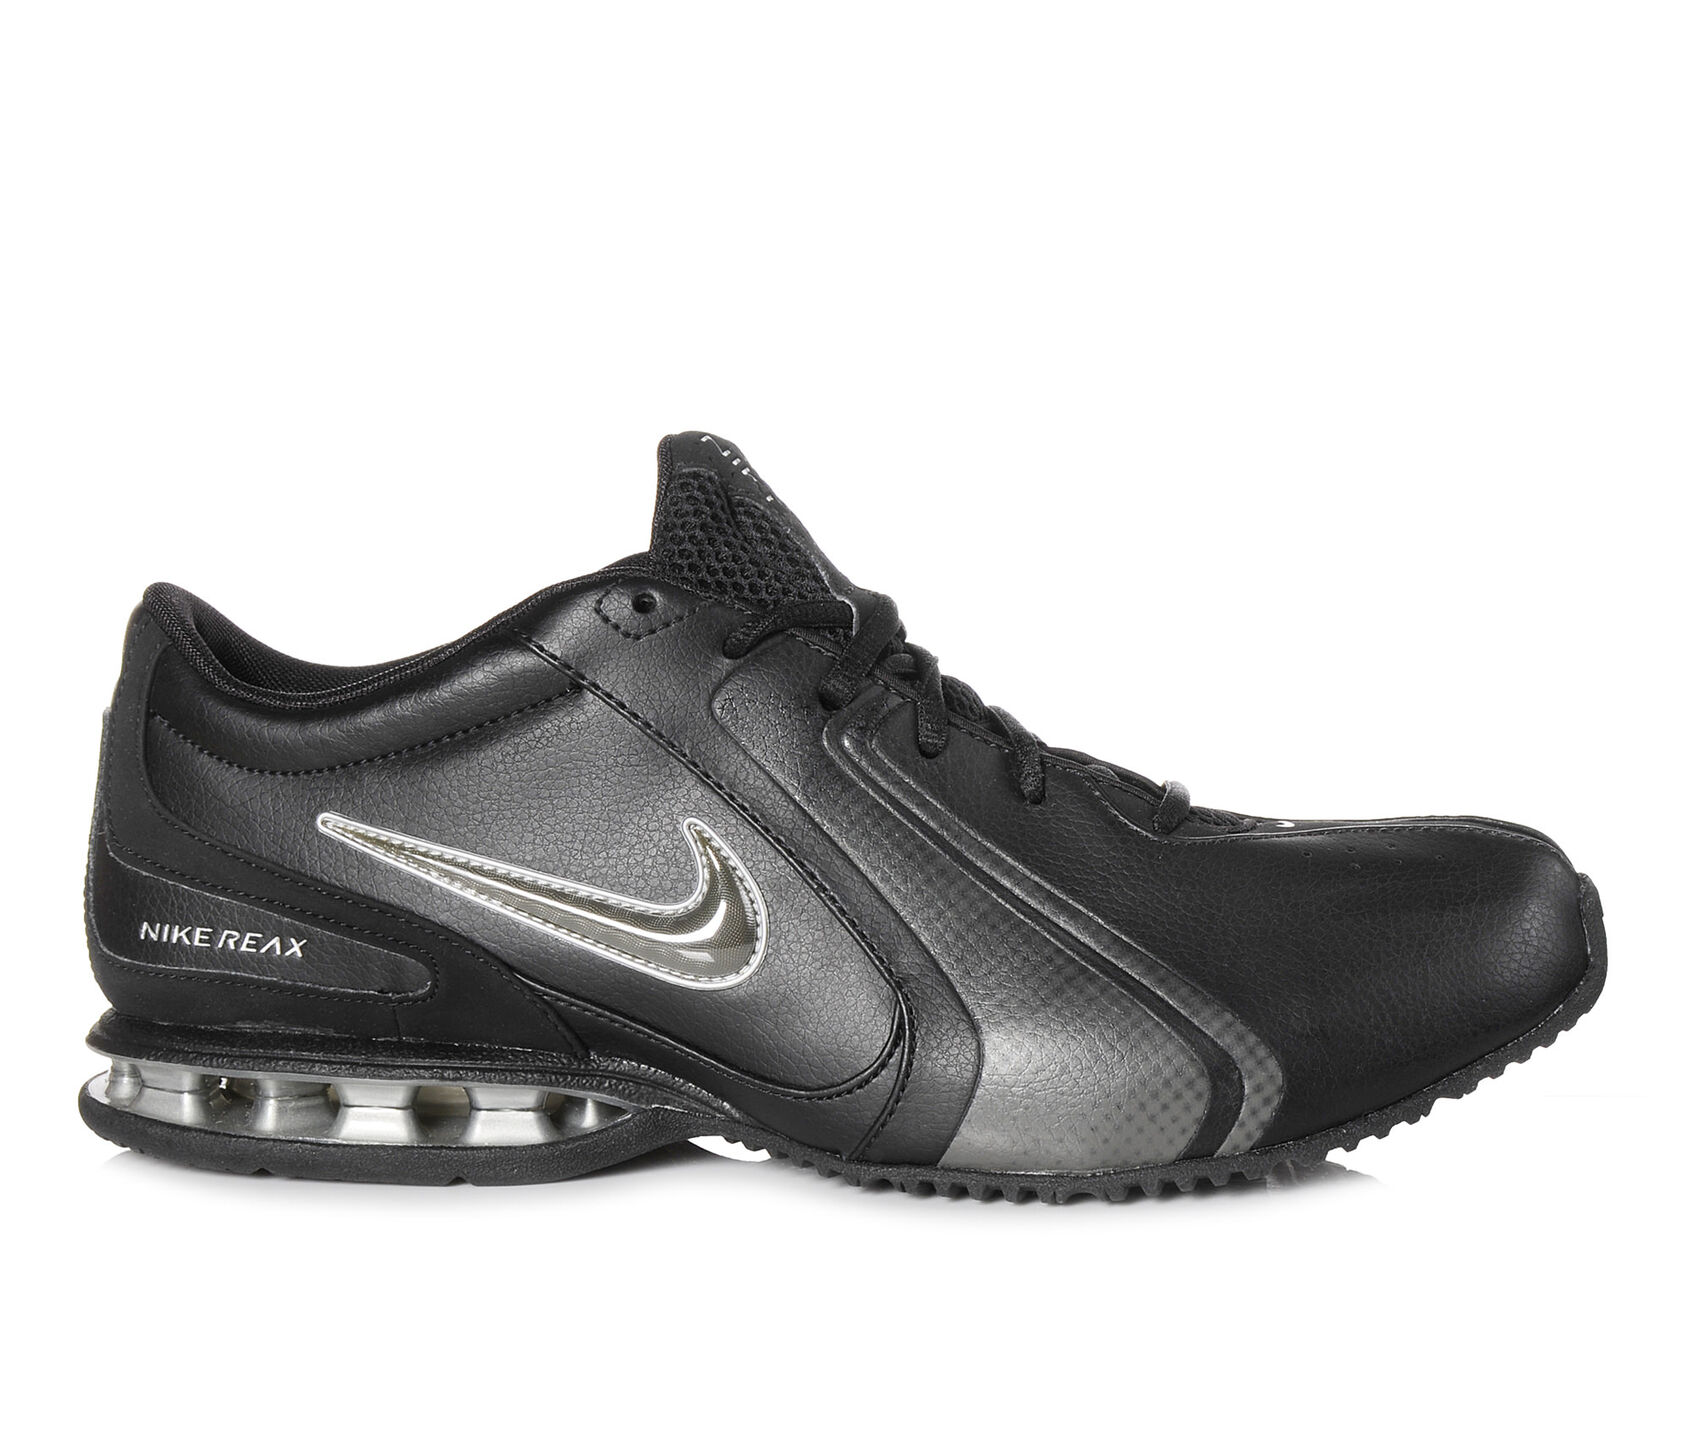 Mens Nike Reax Running Shoes